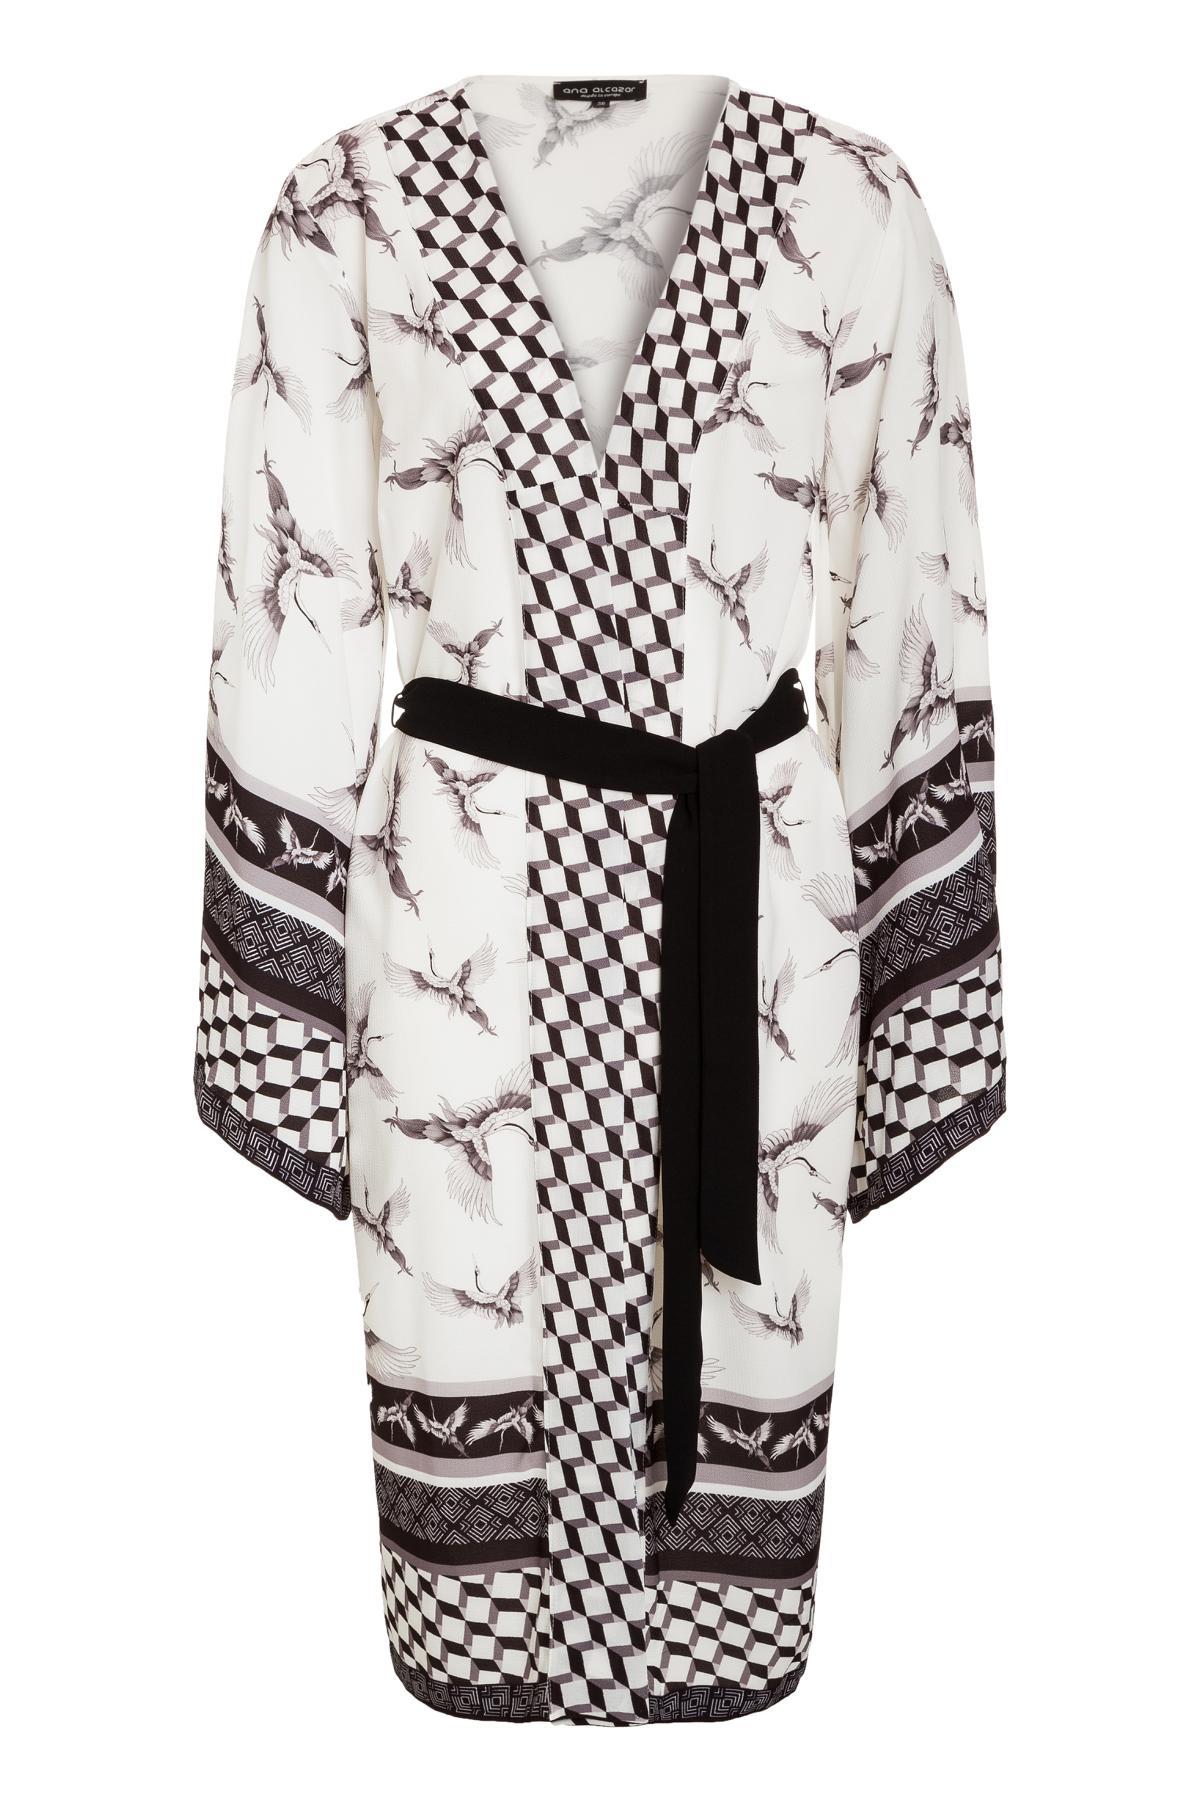 Ana Alcazar Kimono Meybel White